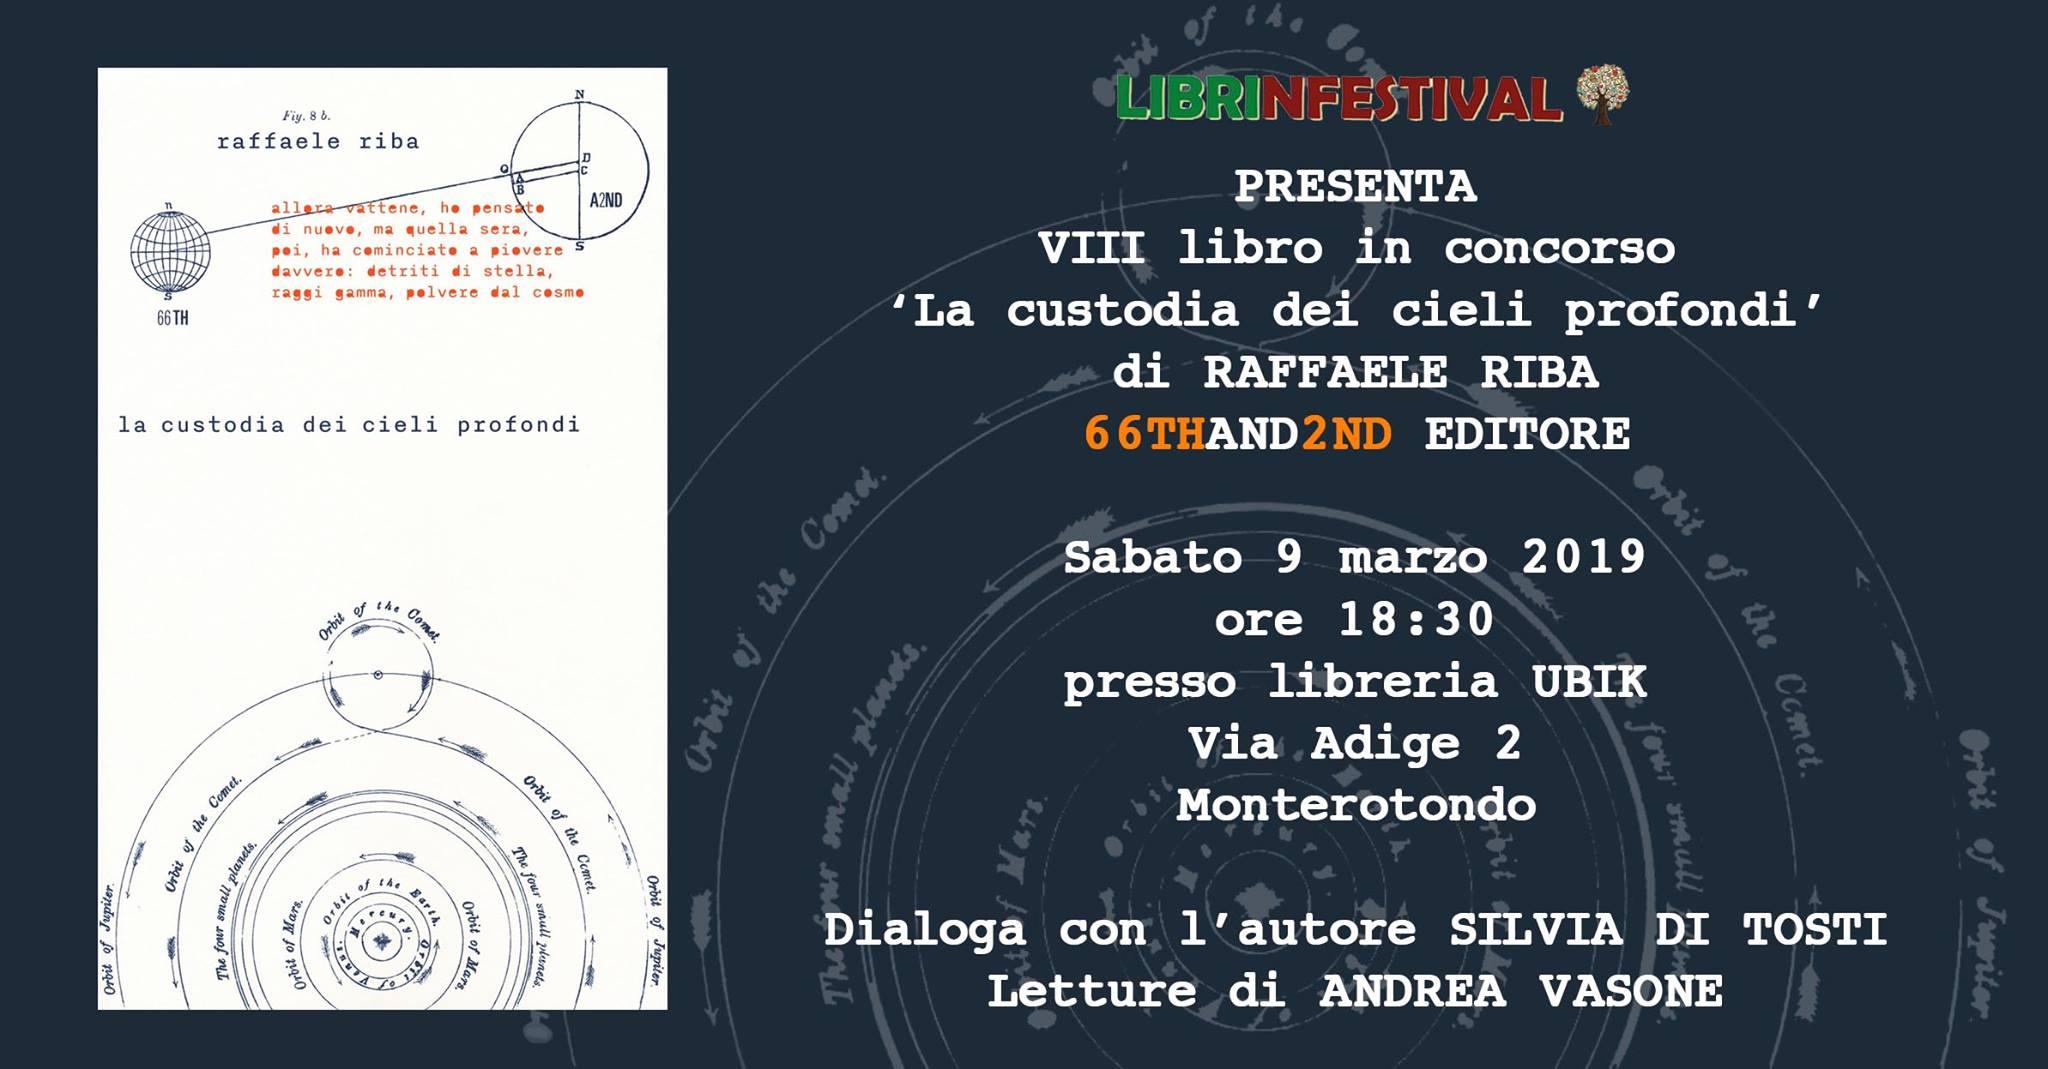 La custodia dei cilei profondi, Raffaele Riba, 66thand2nd,#Librinfestival